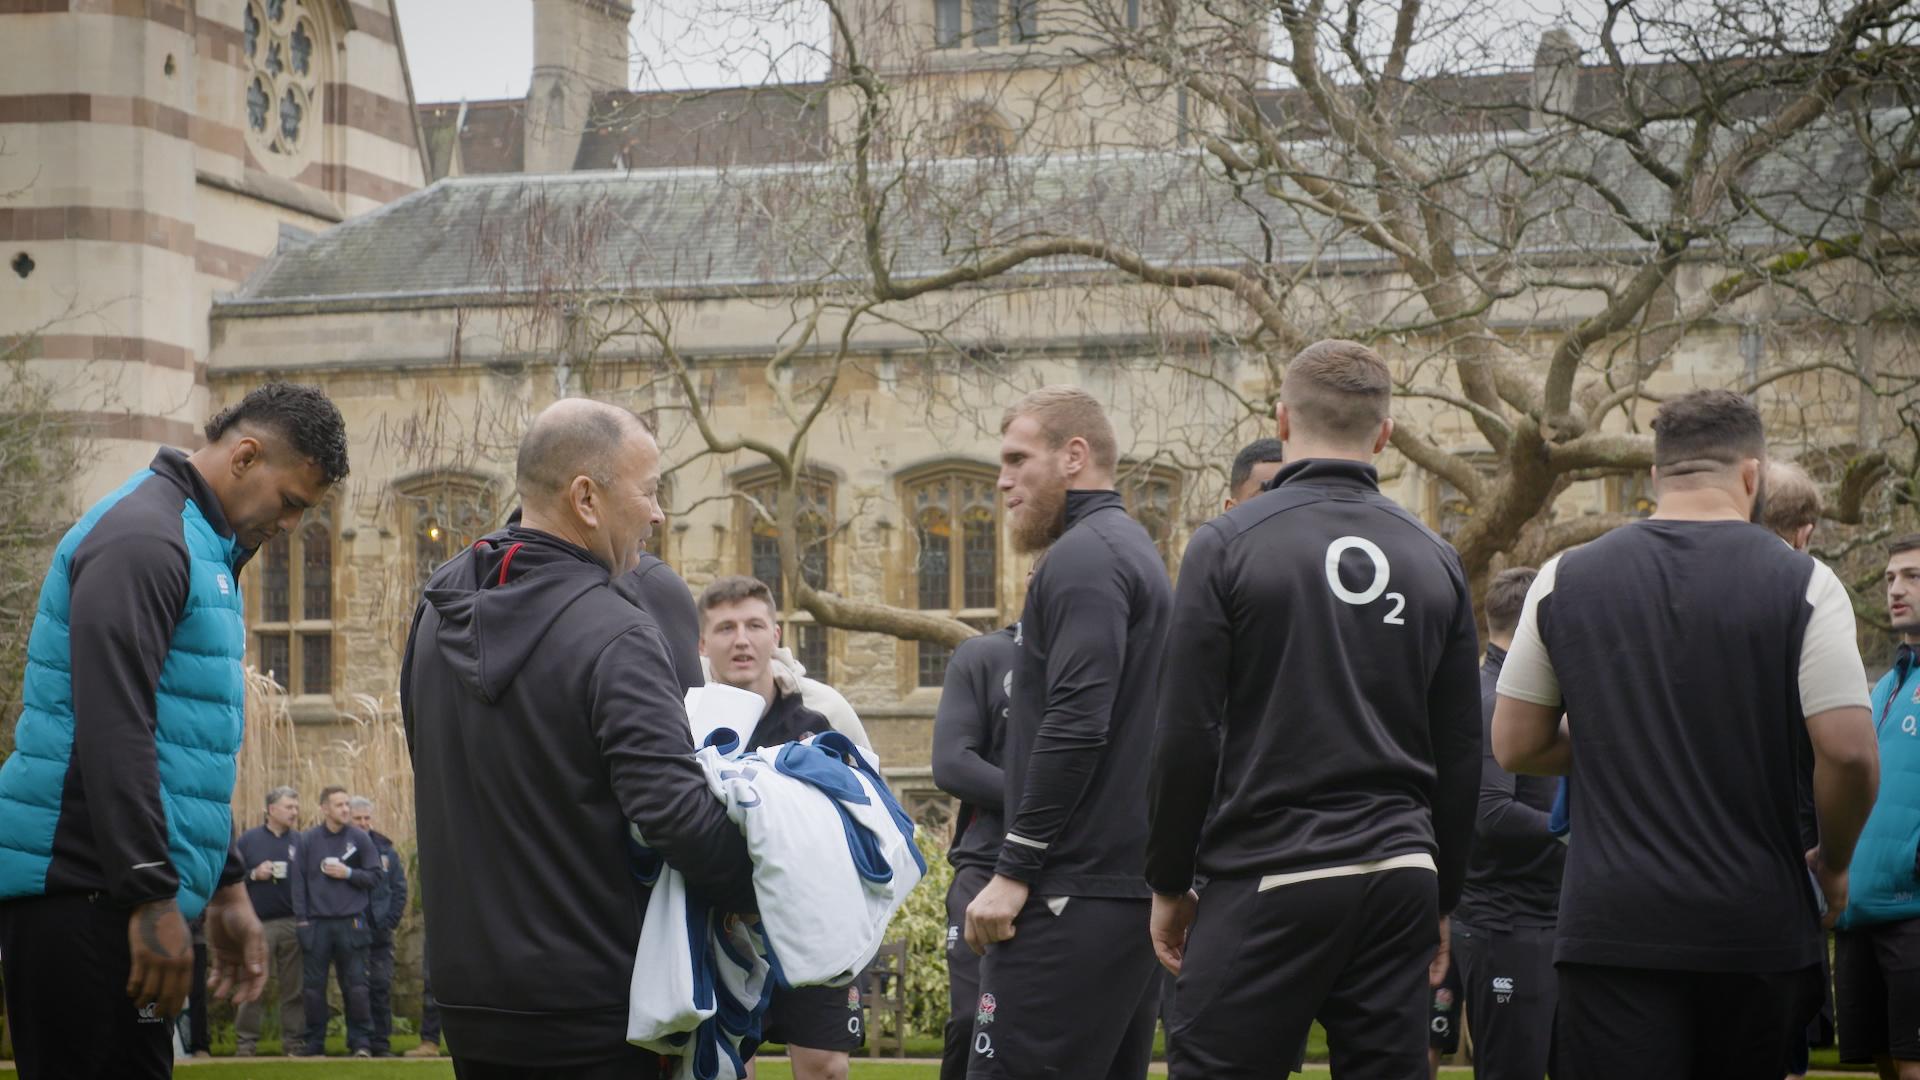 England Rugby visit Balliol 1 March 2019 (photo: Joel Stocker/RFU)